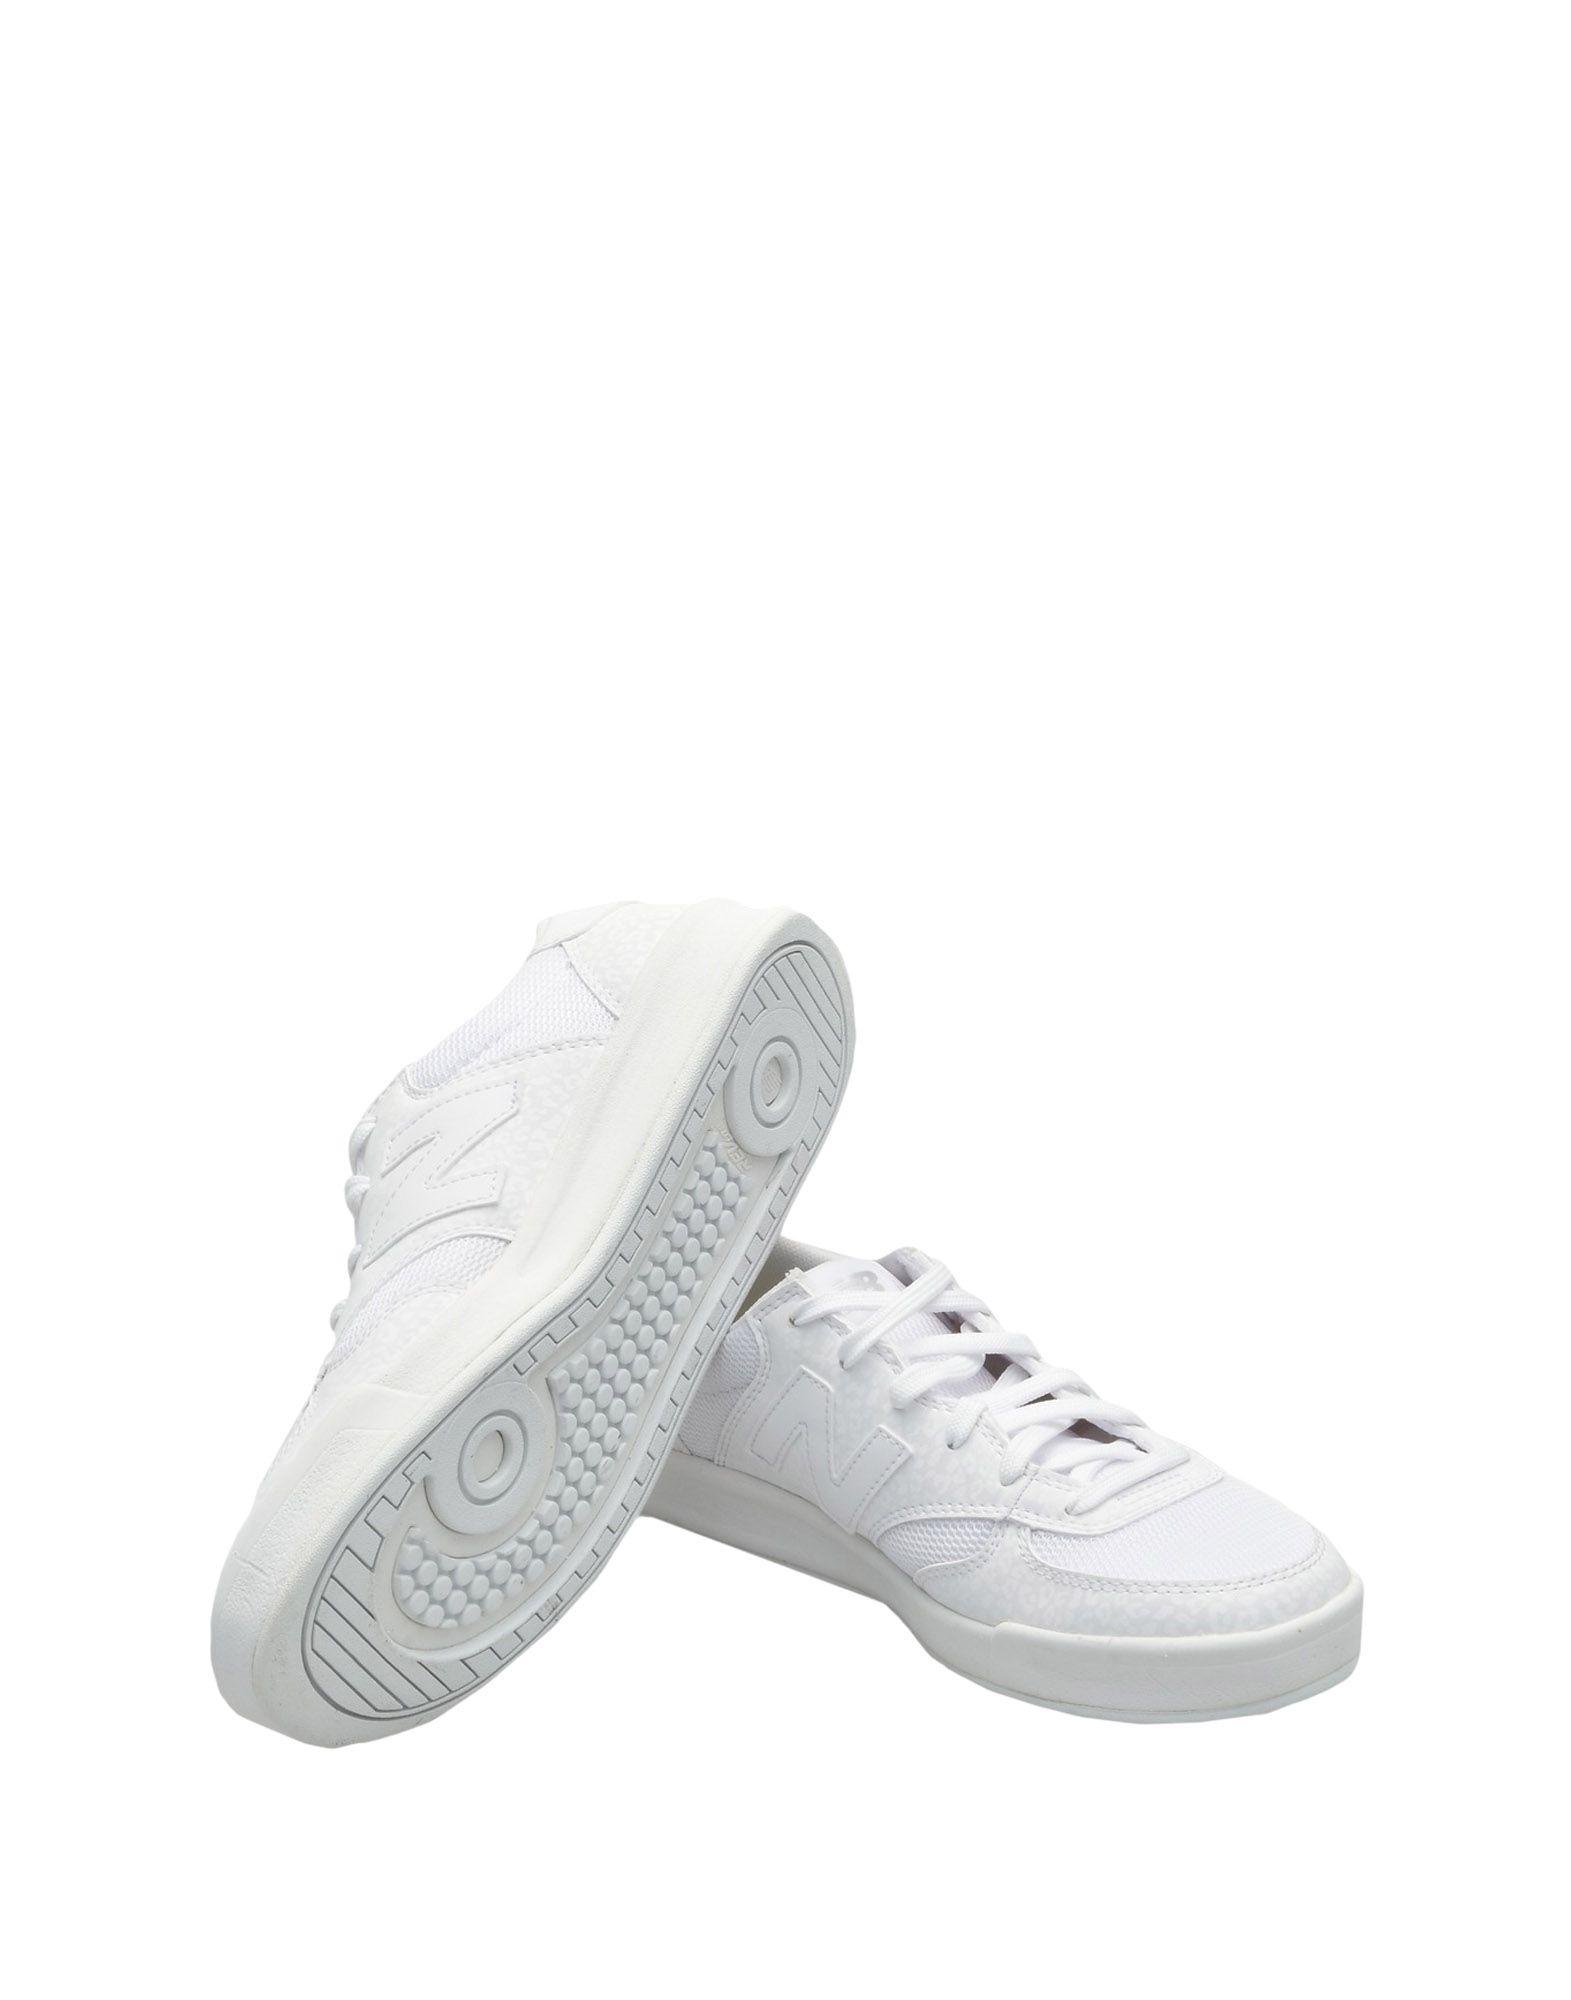 New Balance 300 11496722MO White Reflective Pack  11496722MO 300 Gute Qualität beliebte Schuhe 53cf96